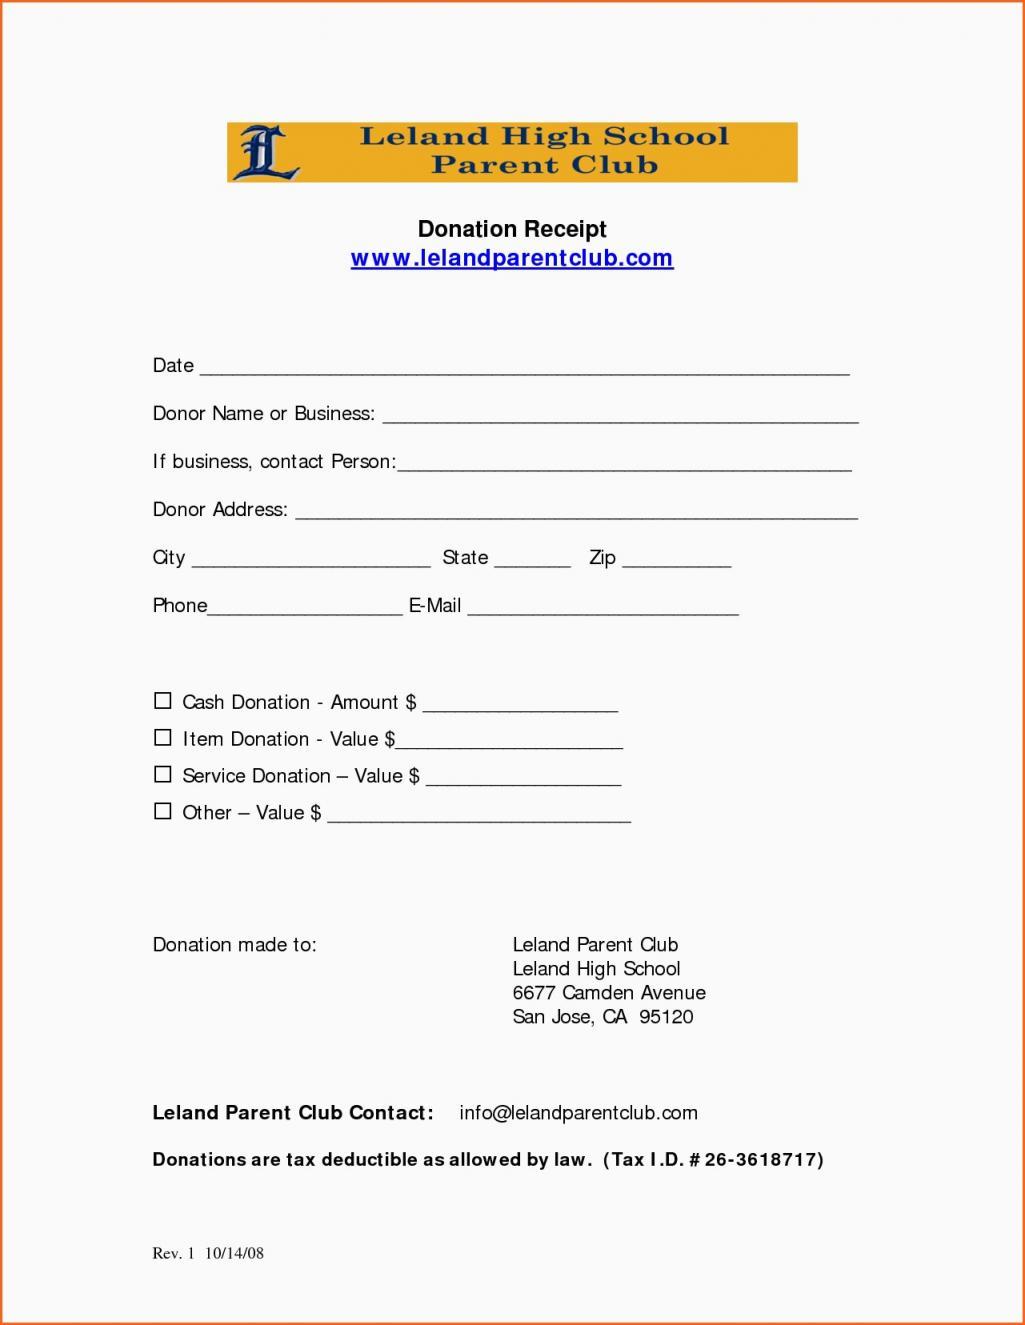 Church Donation Tax Deduction Receipt Template